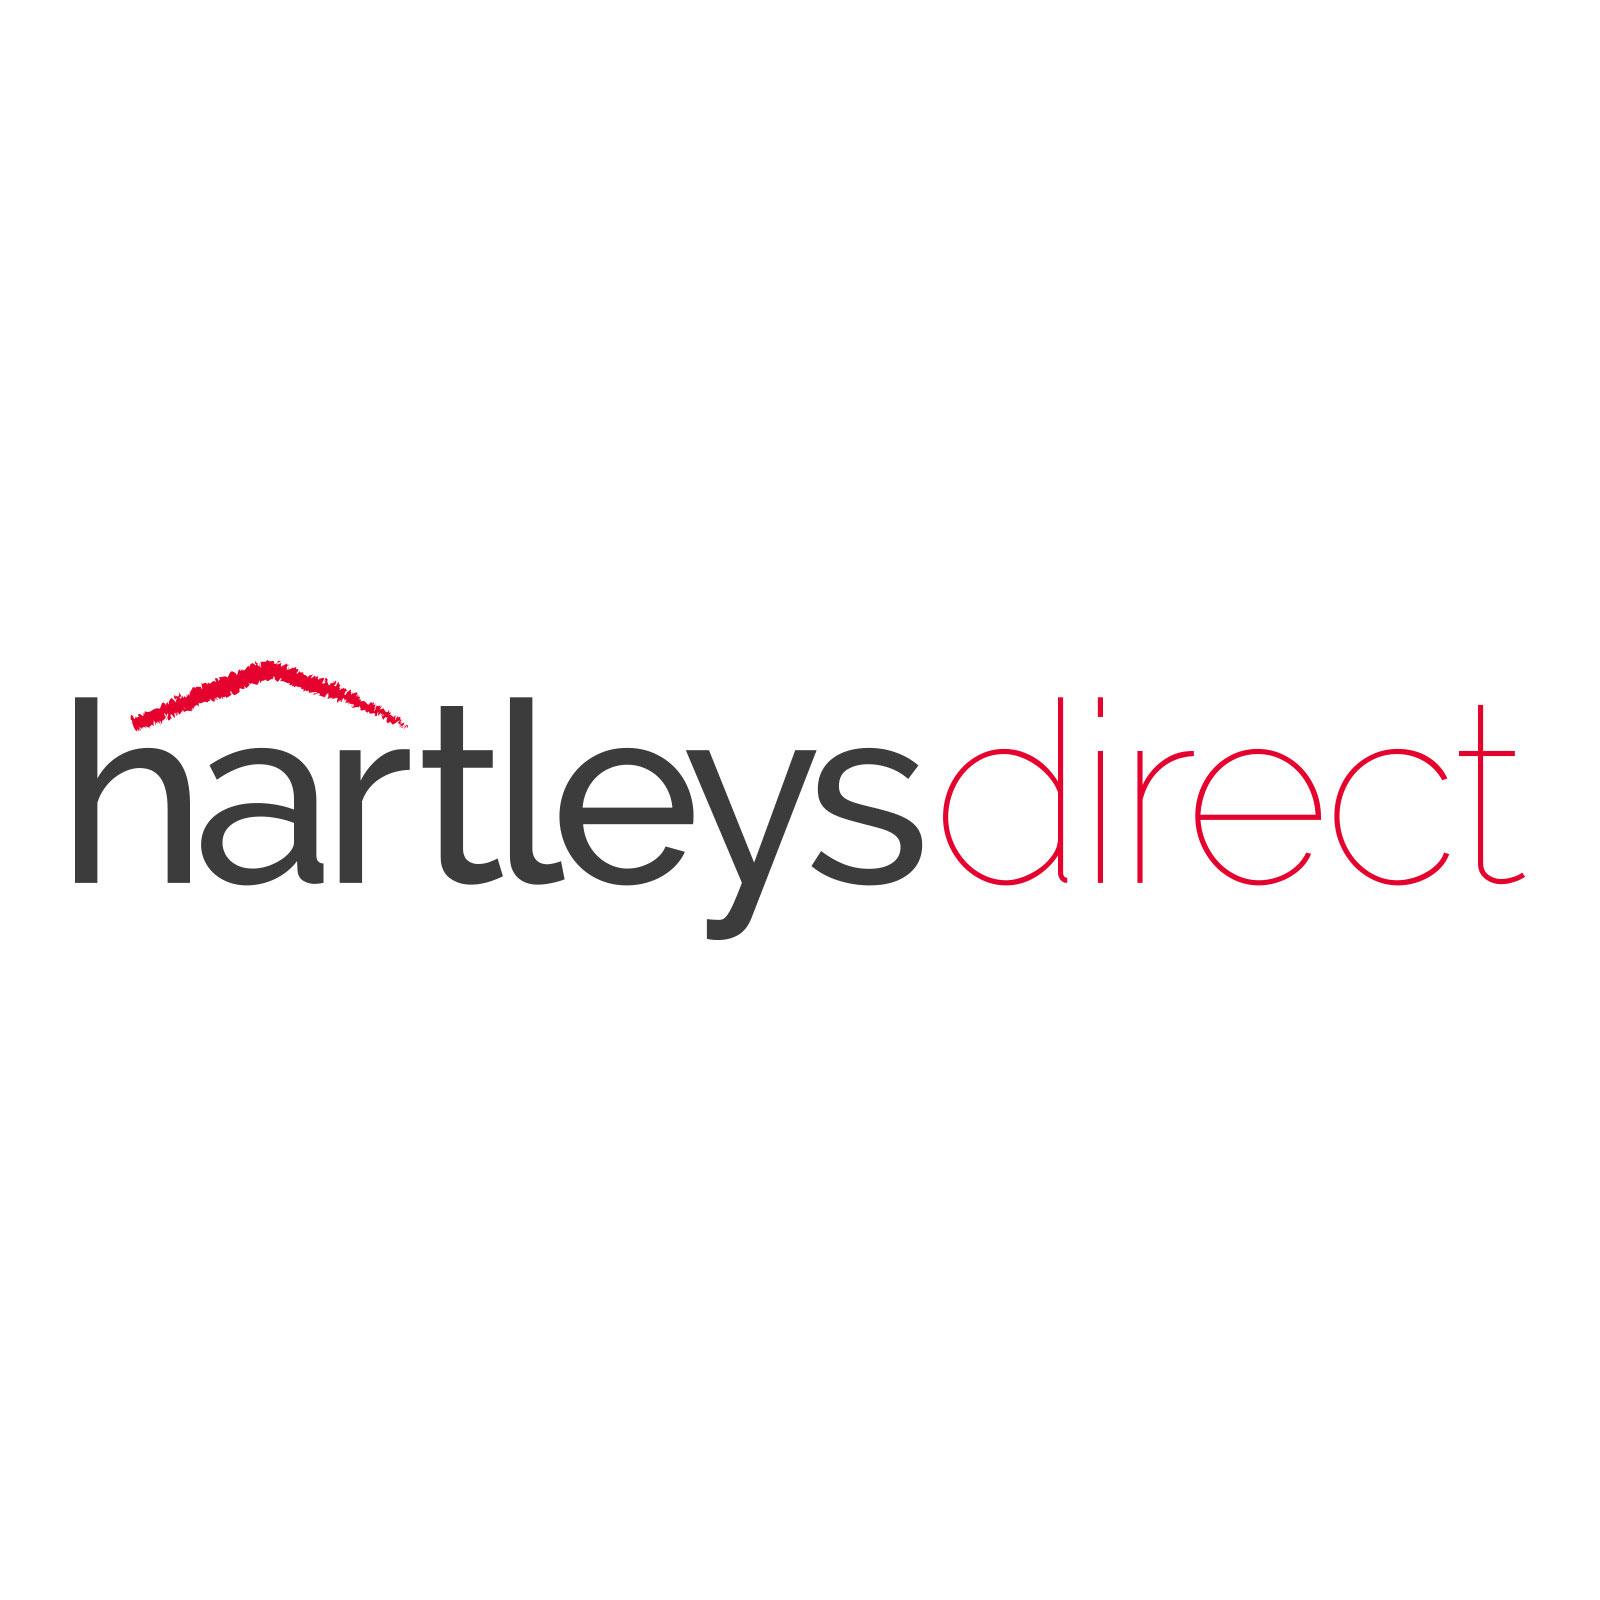 Hartleys-Grey-4-Tier-Folding-Ladder-Shelf-on-White-Background.jpg